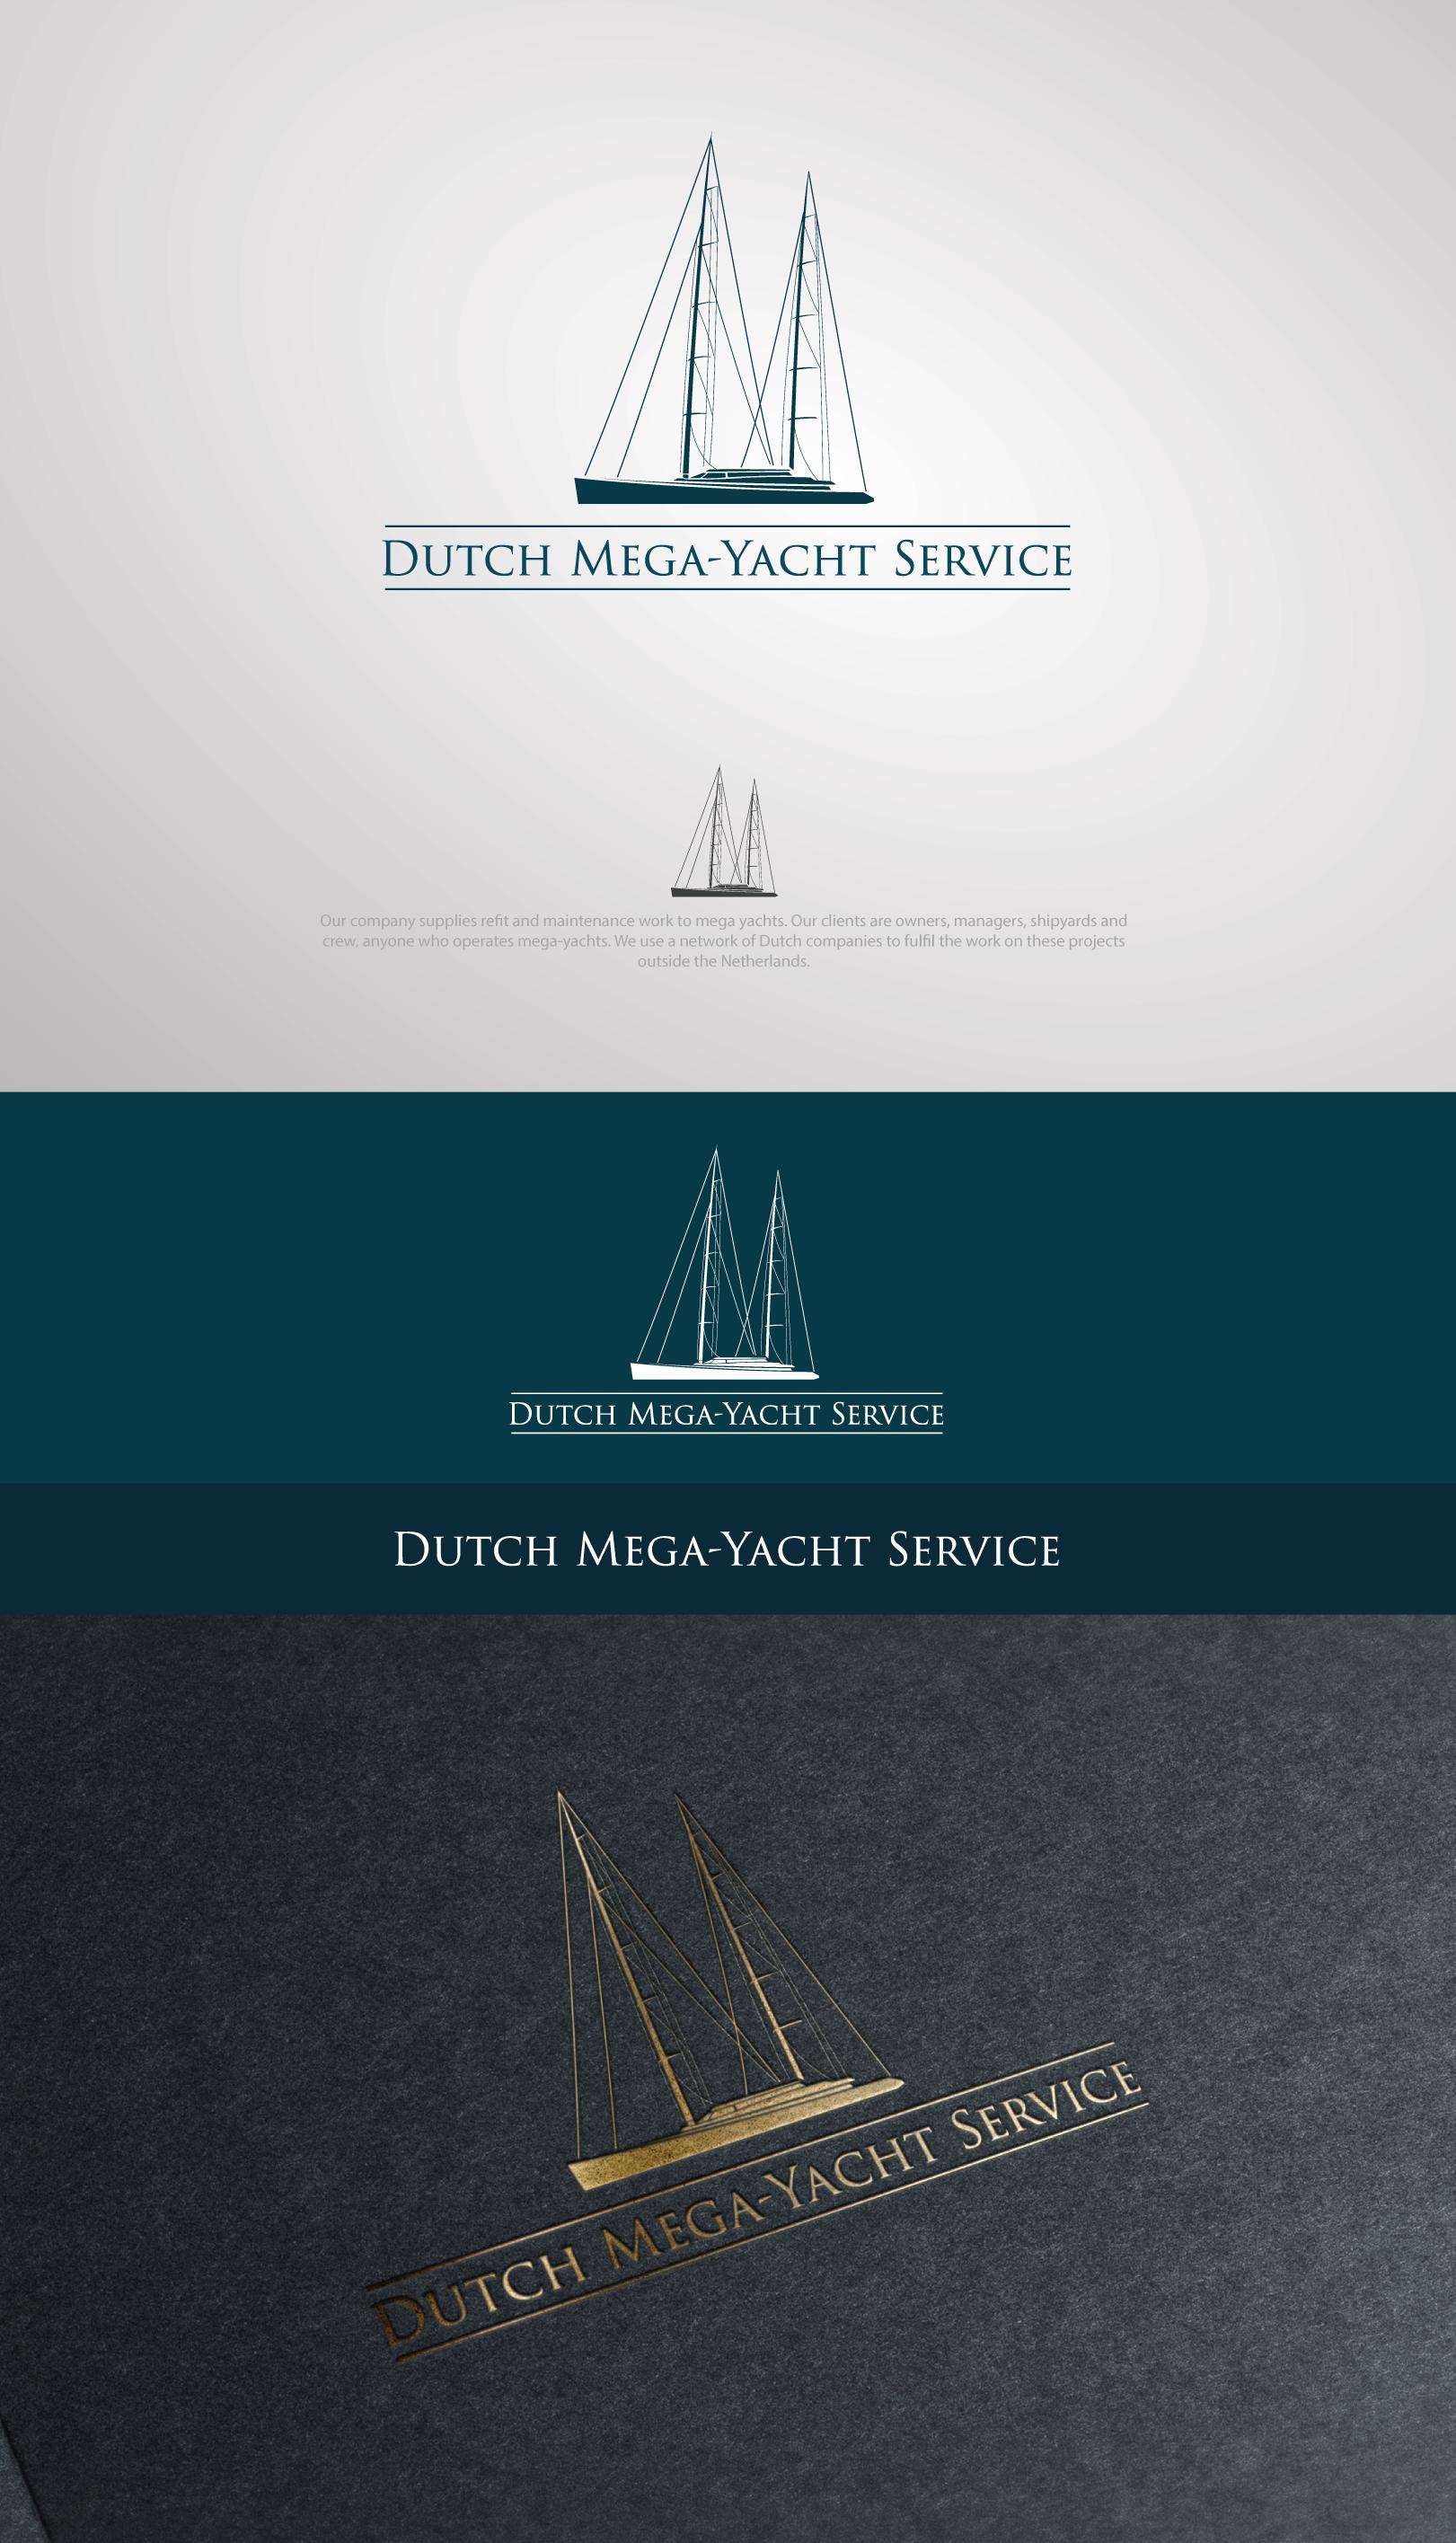 Dutch Mega-Yacht Service Logo Design Competition.